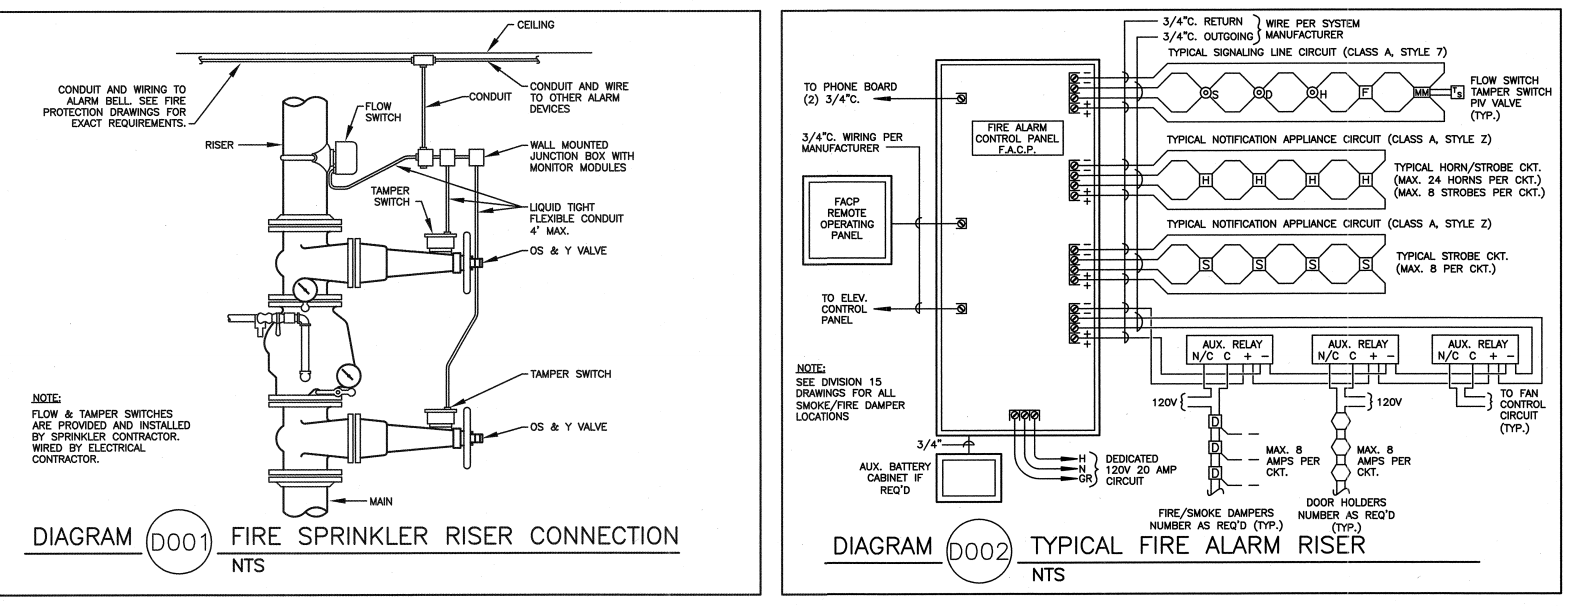 Enjoyable Fire Alarm Elevator Wiring Diagram Basic Electronics Wiring Diagram Wiring Cloud Rdonaheevemohammedshrineorg